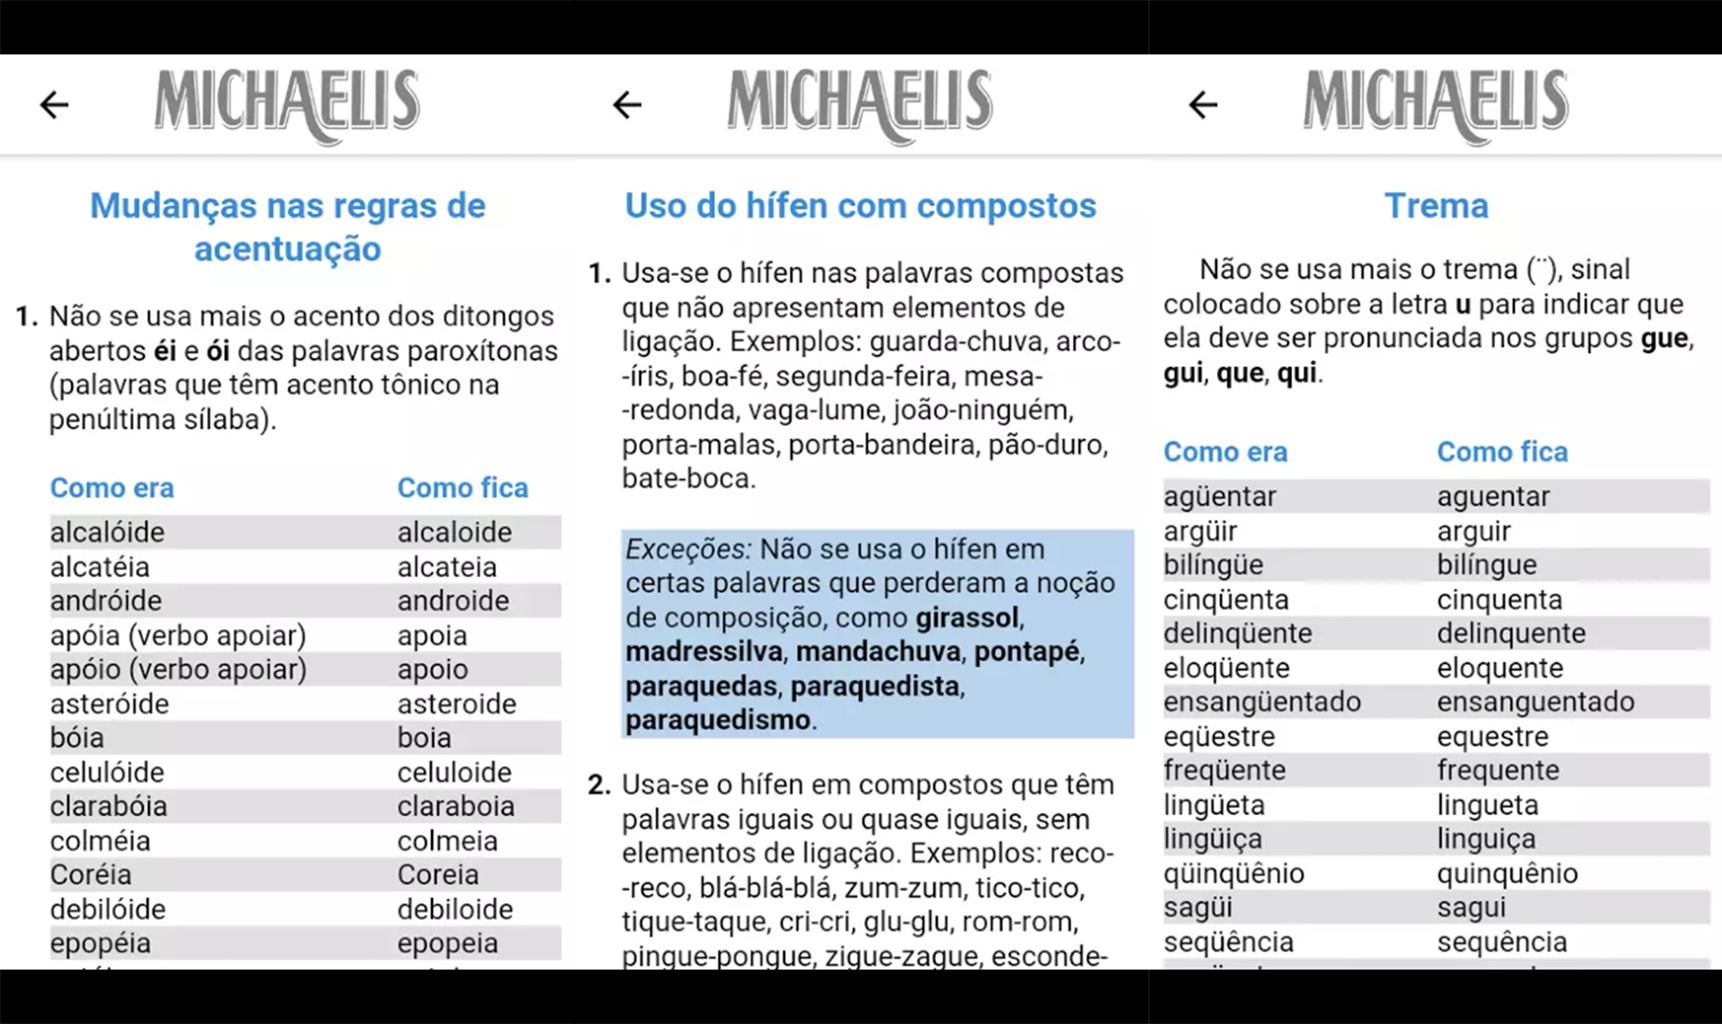 Michaelis3